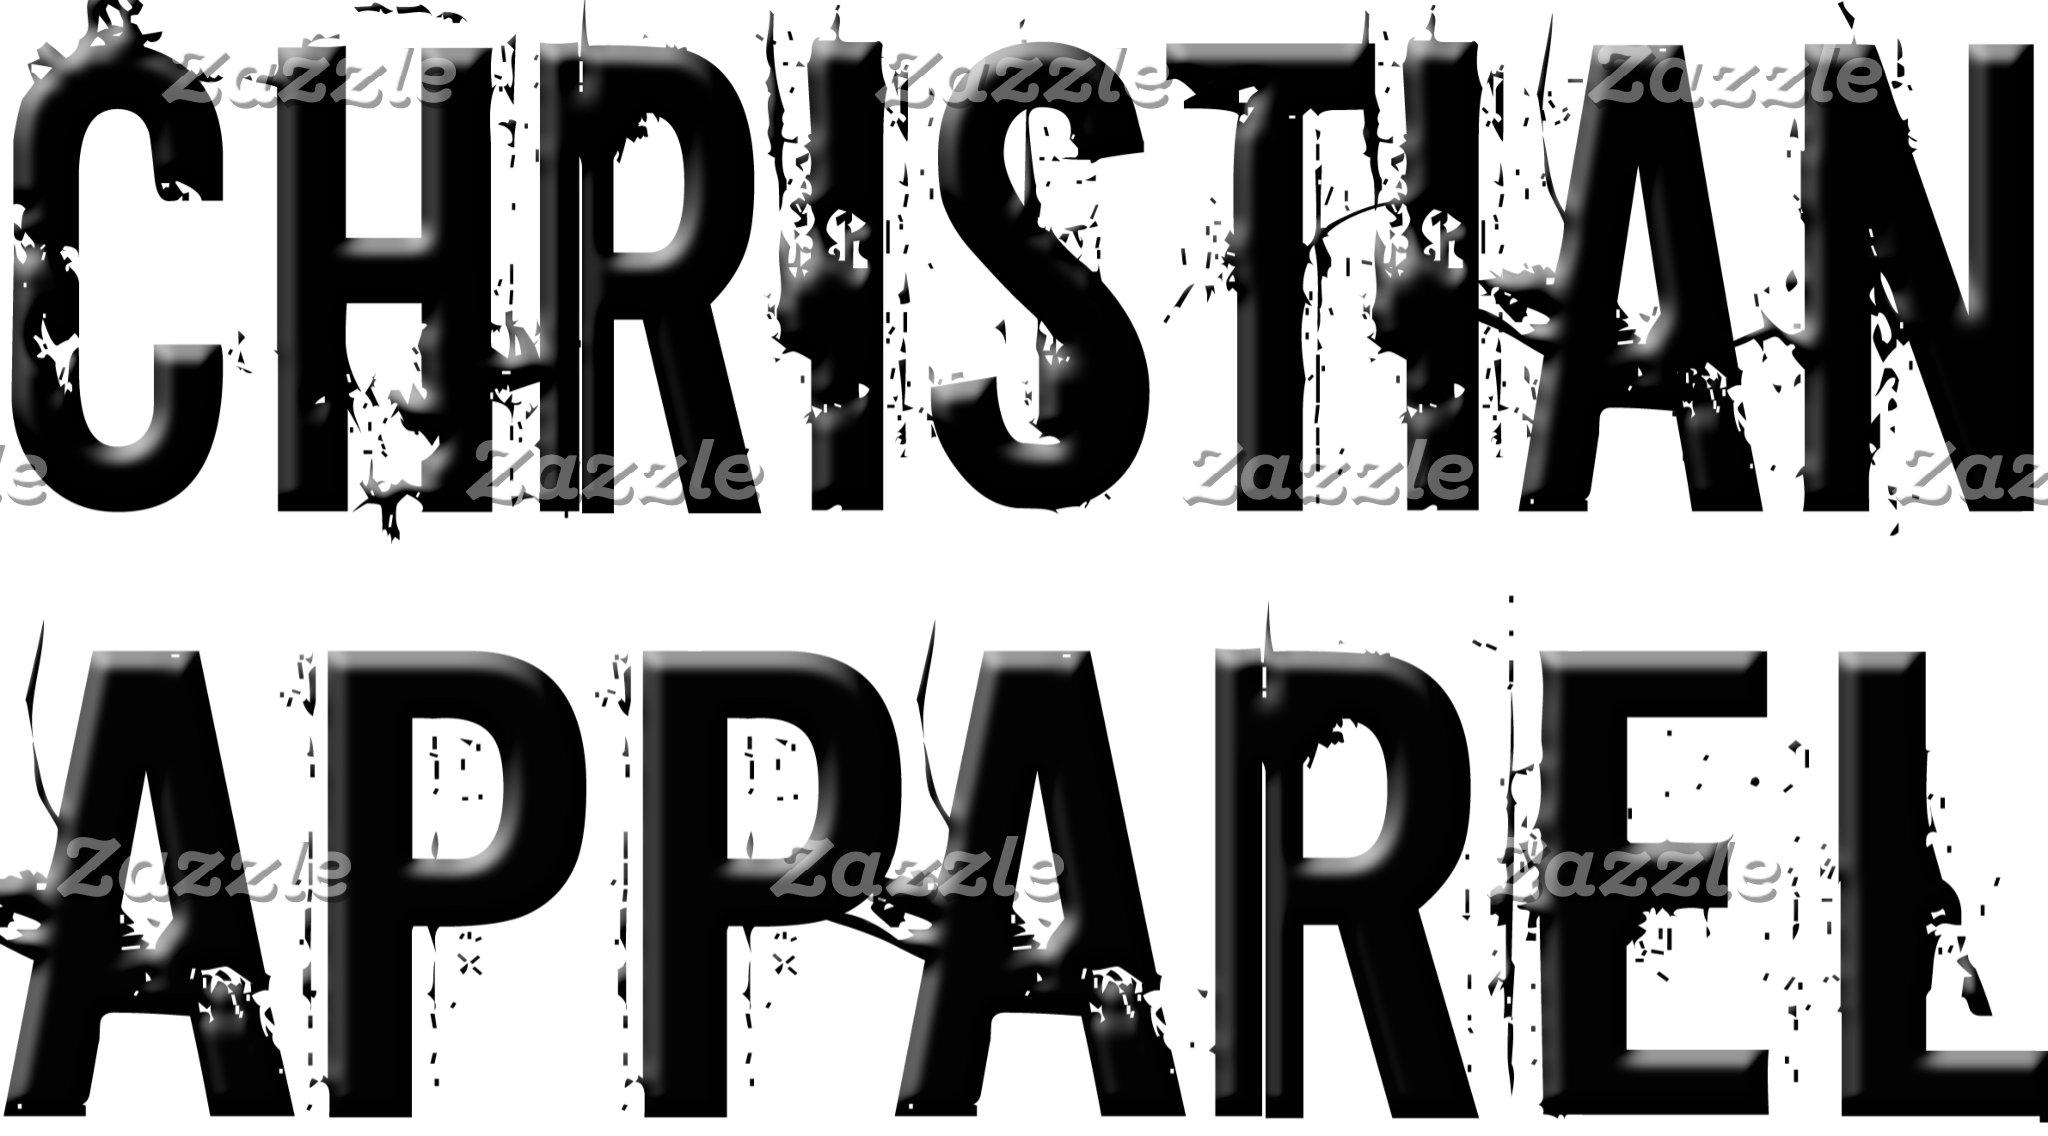 Christian Apparel